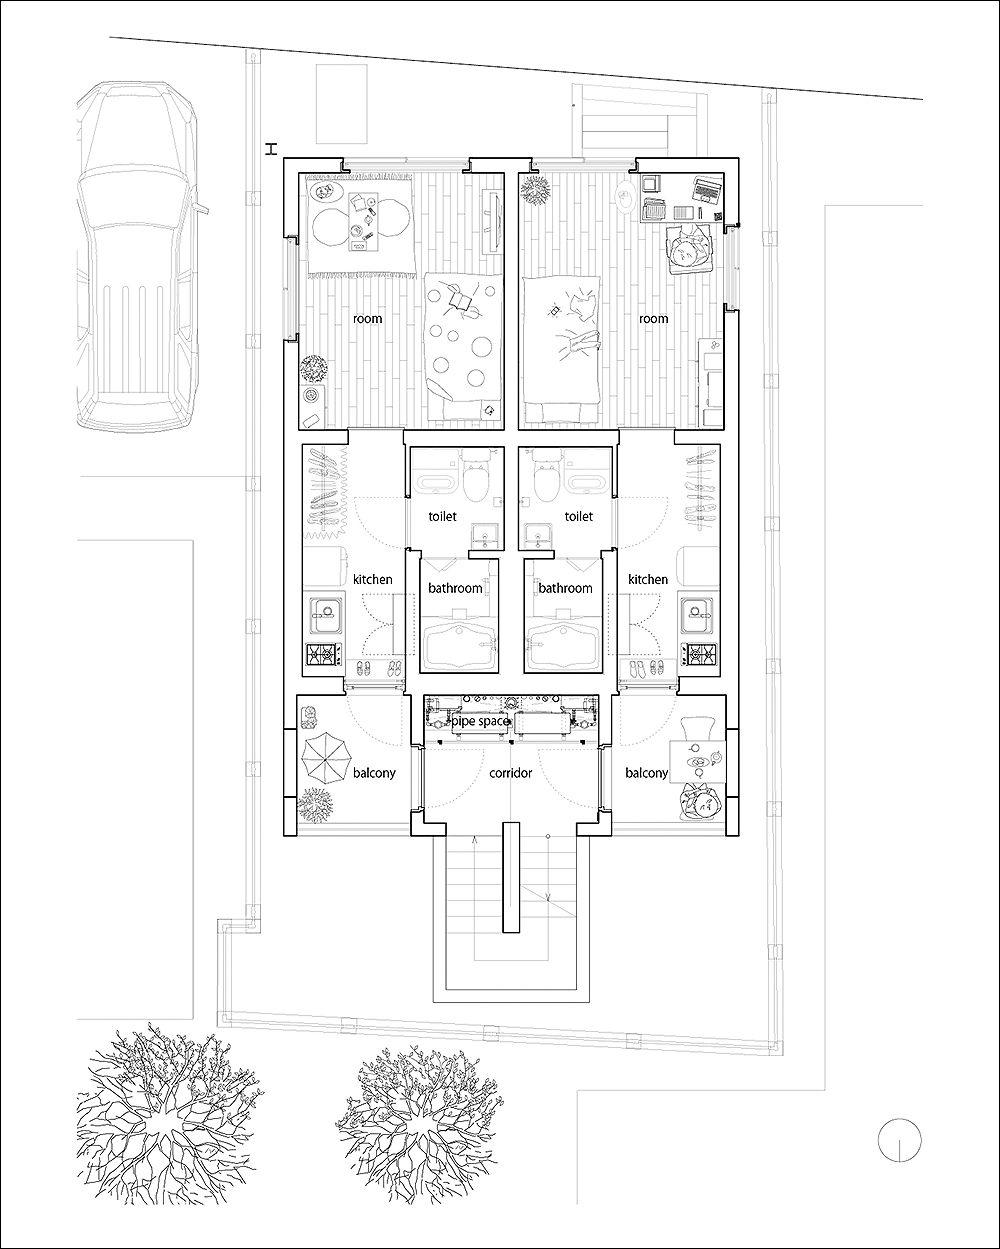 Housing S - Ryuji Fujimura Architects